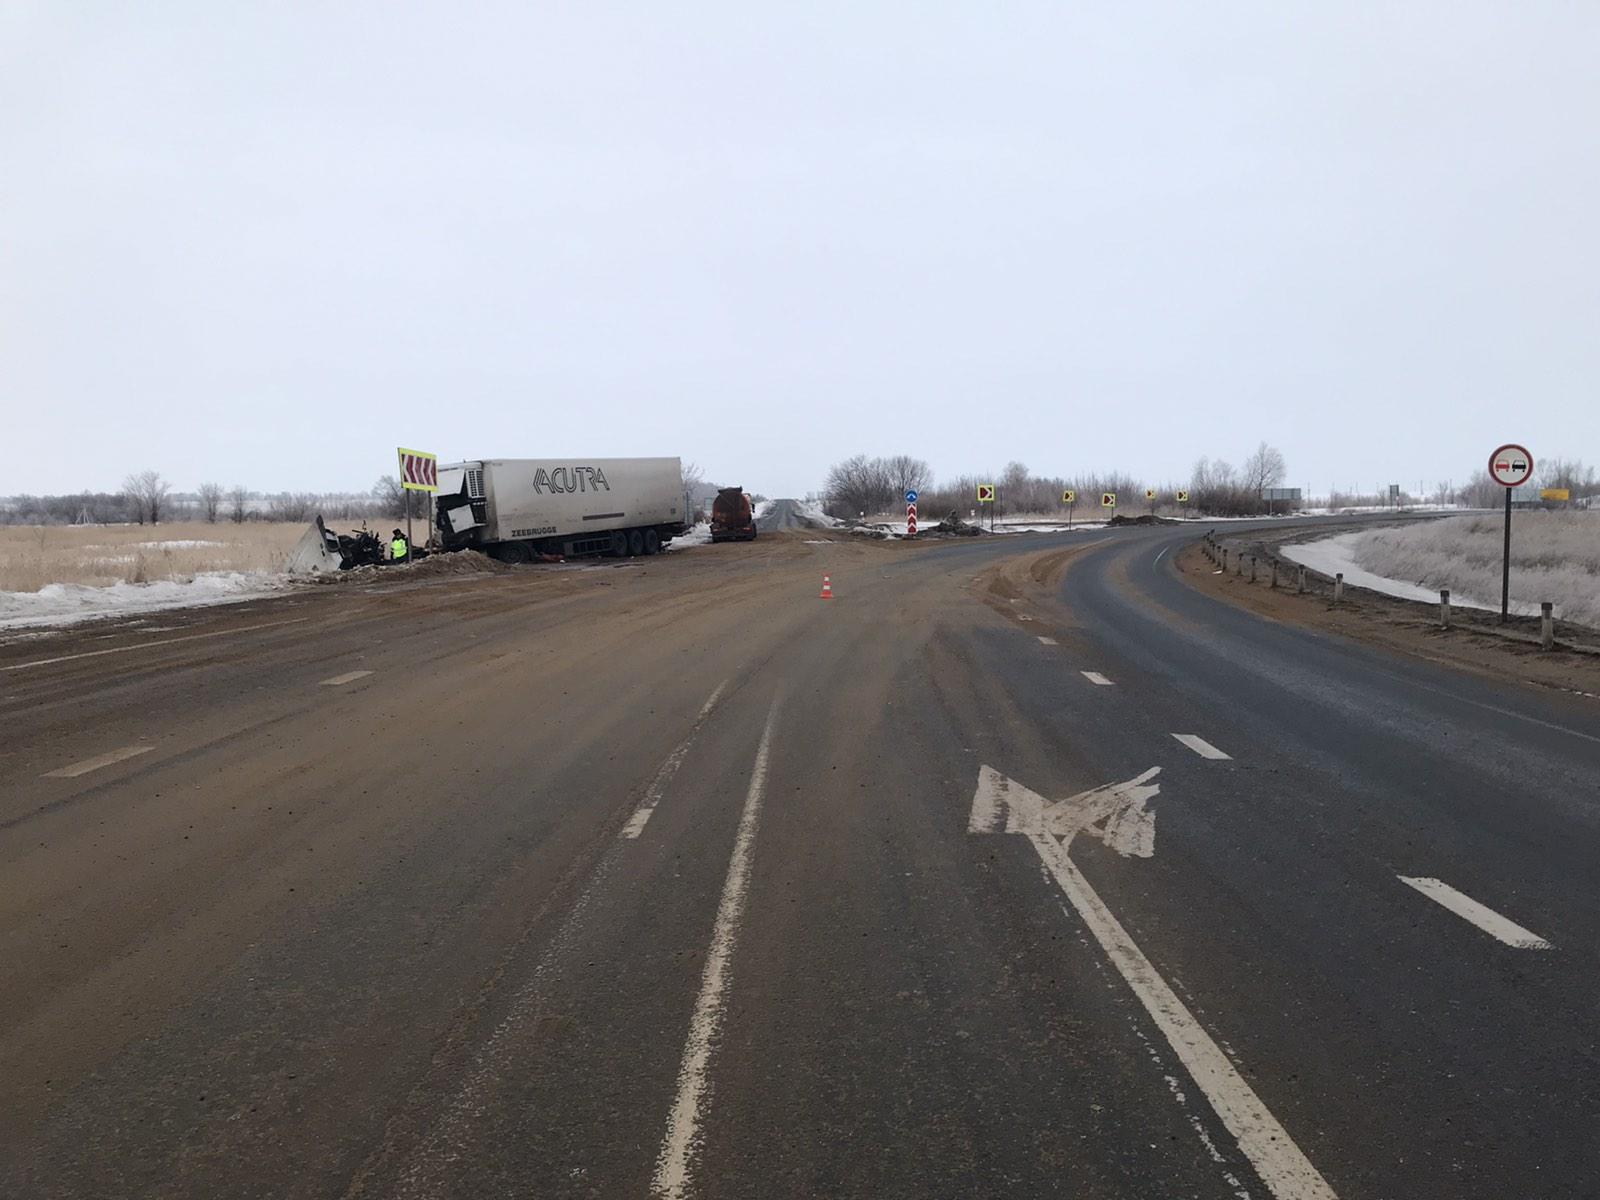 В Самарской области на трассе столкнулись два грузовика